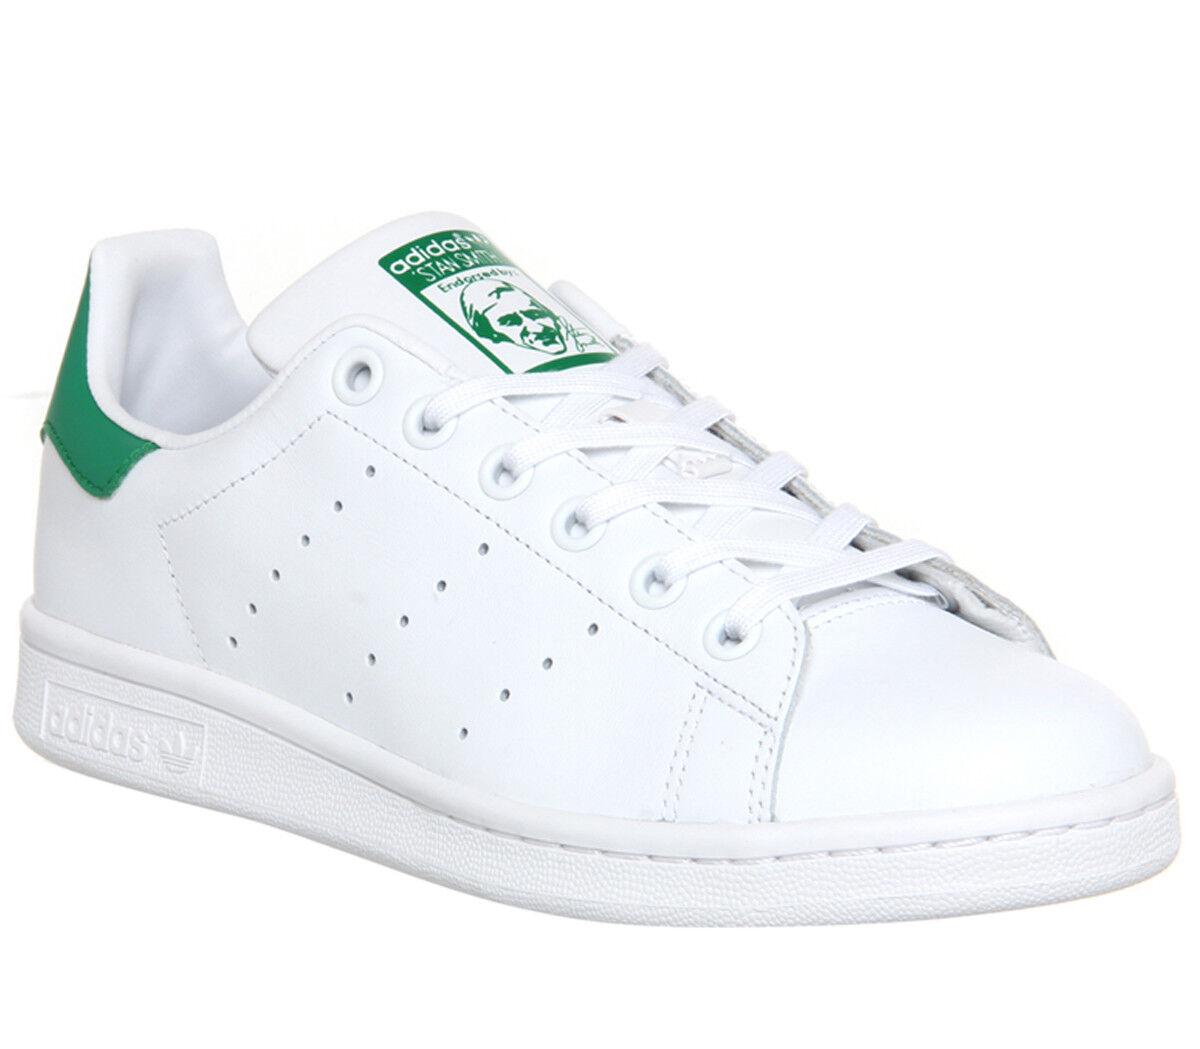 stan adidas stan smith formateurs formateurs blanche chaussures vert 411614  ... e07879dcd423